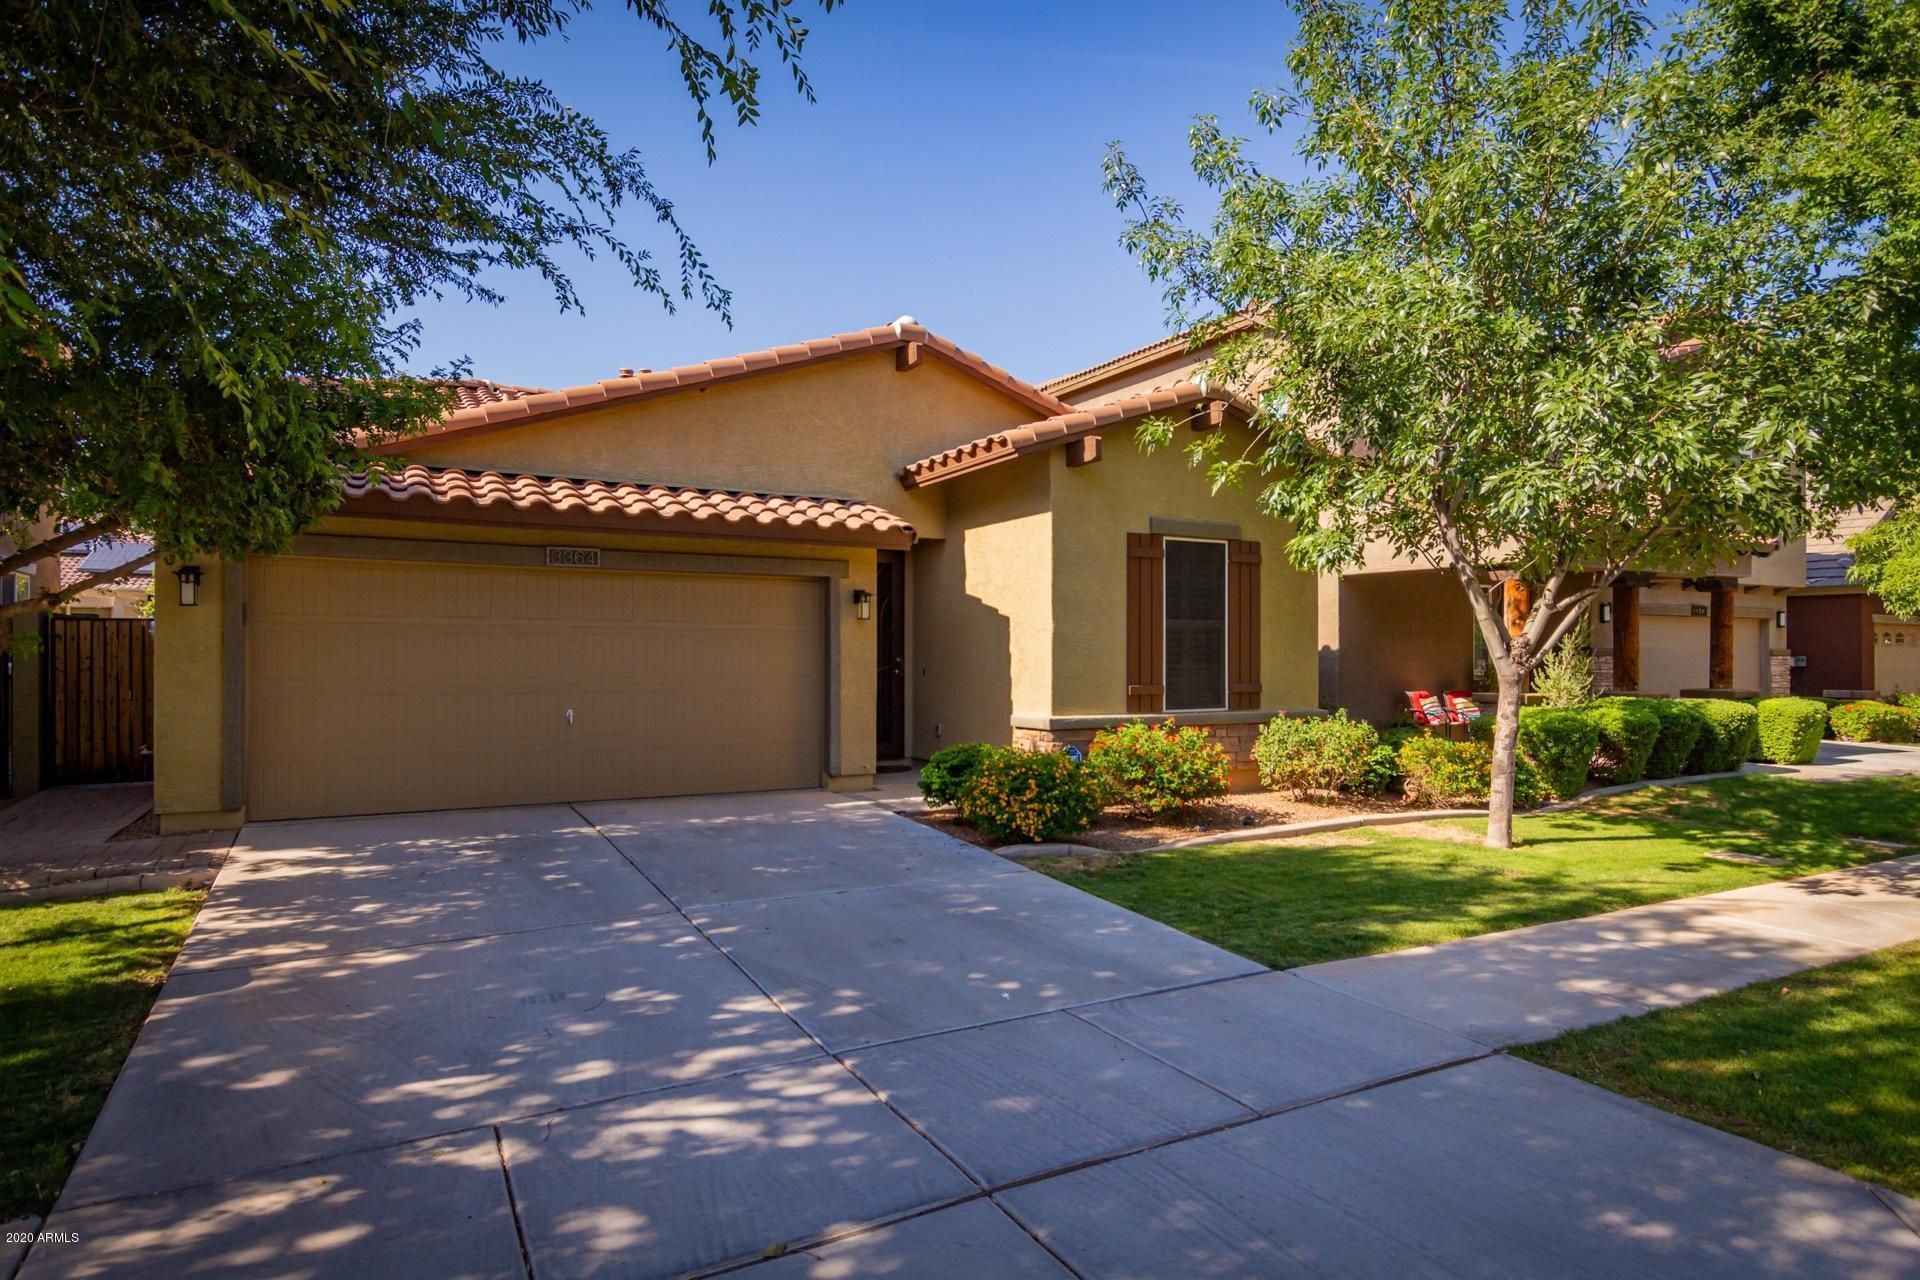 Photo of 3364 E CHEYENNE Street, Gilbert, AZ 85296